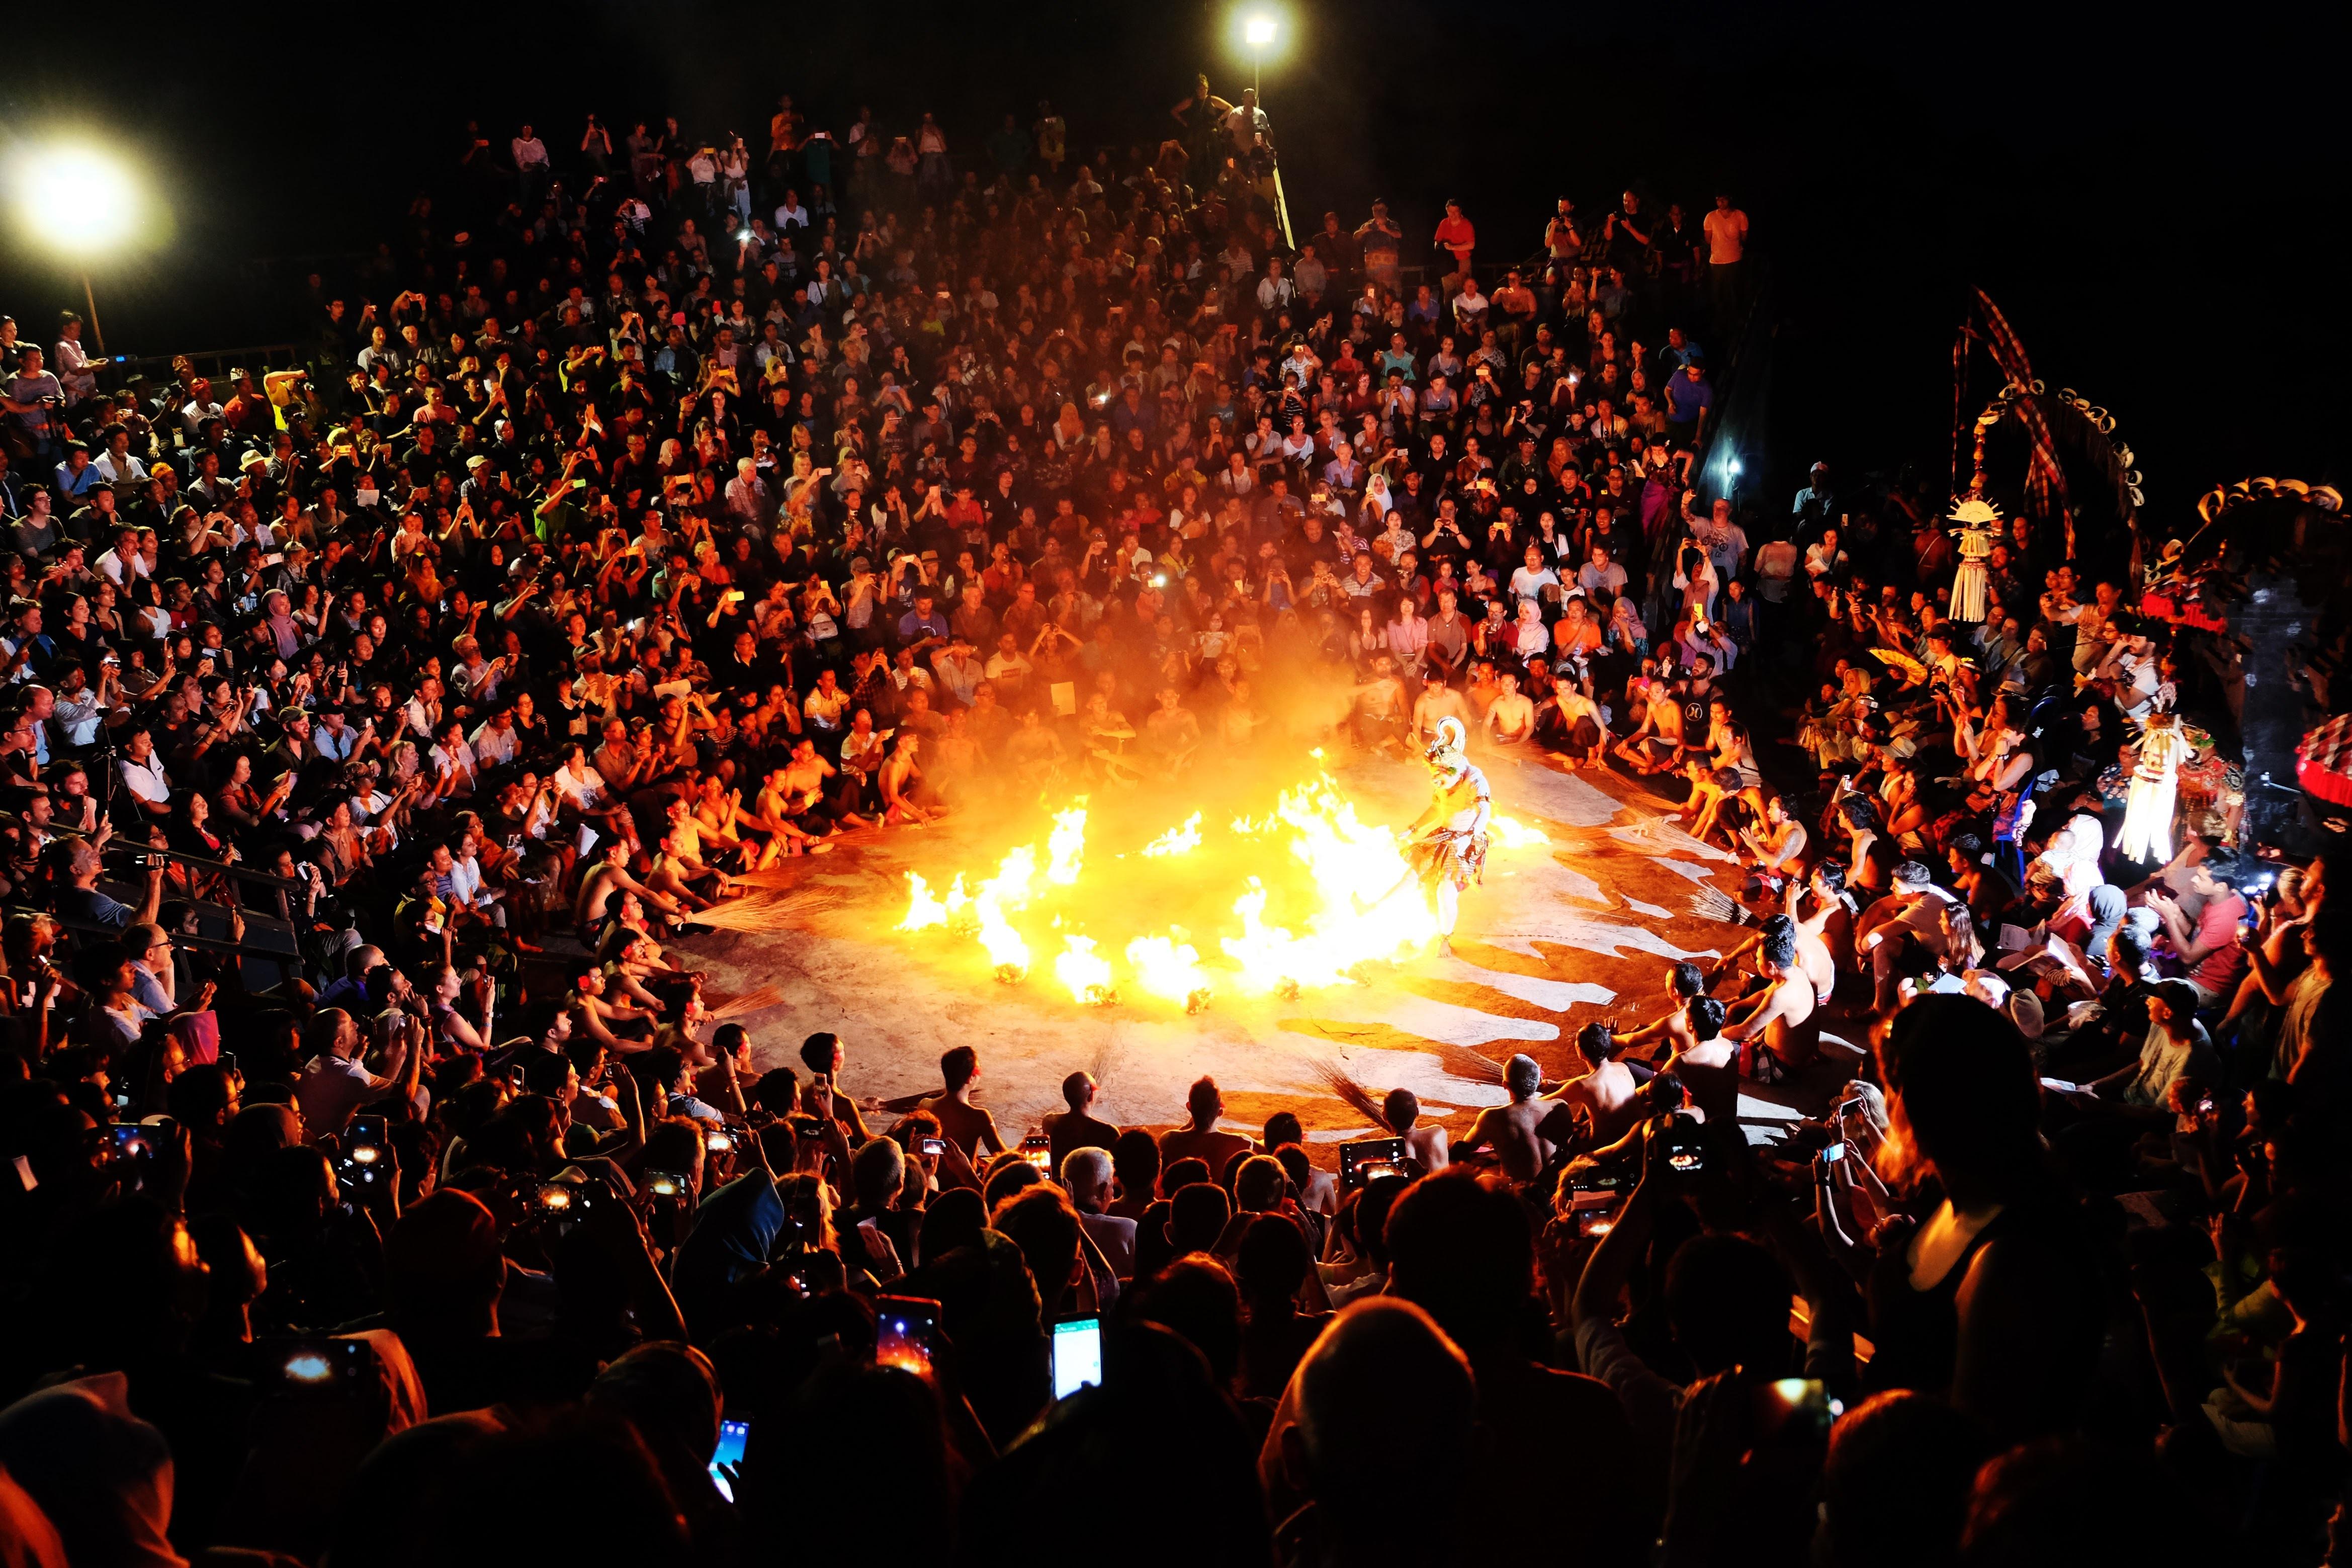 fire burning in the dance floor